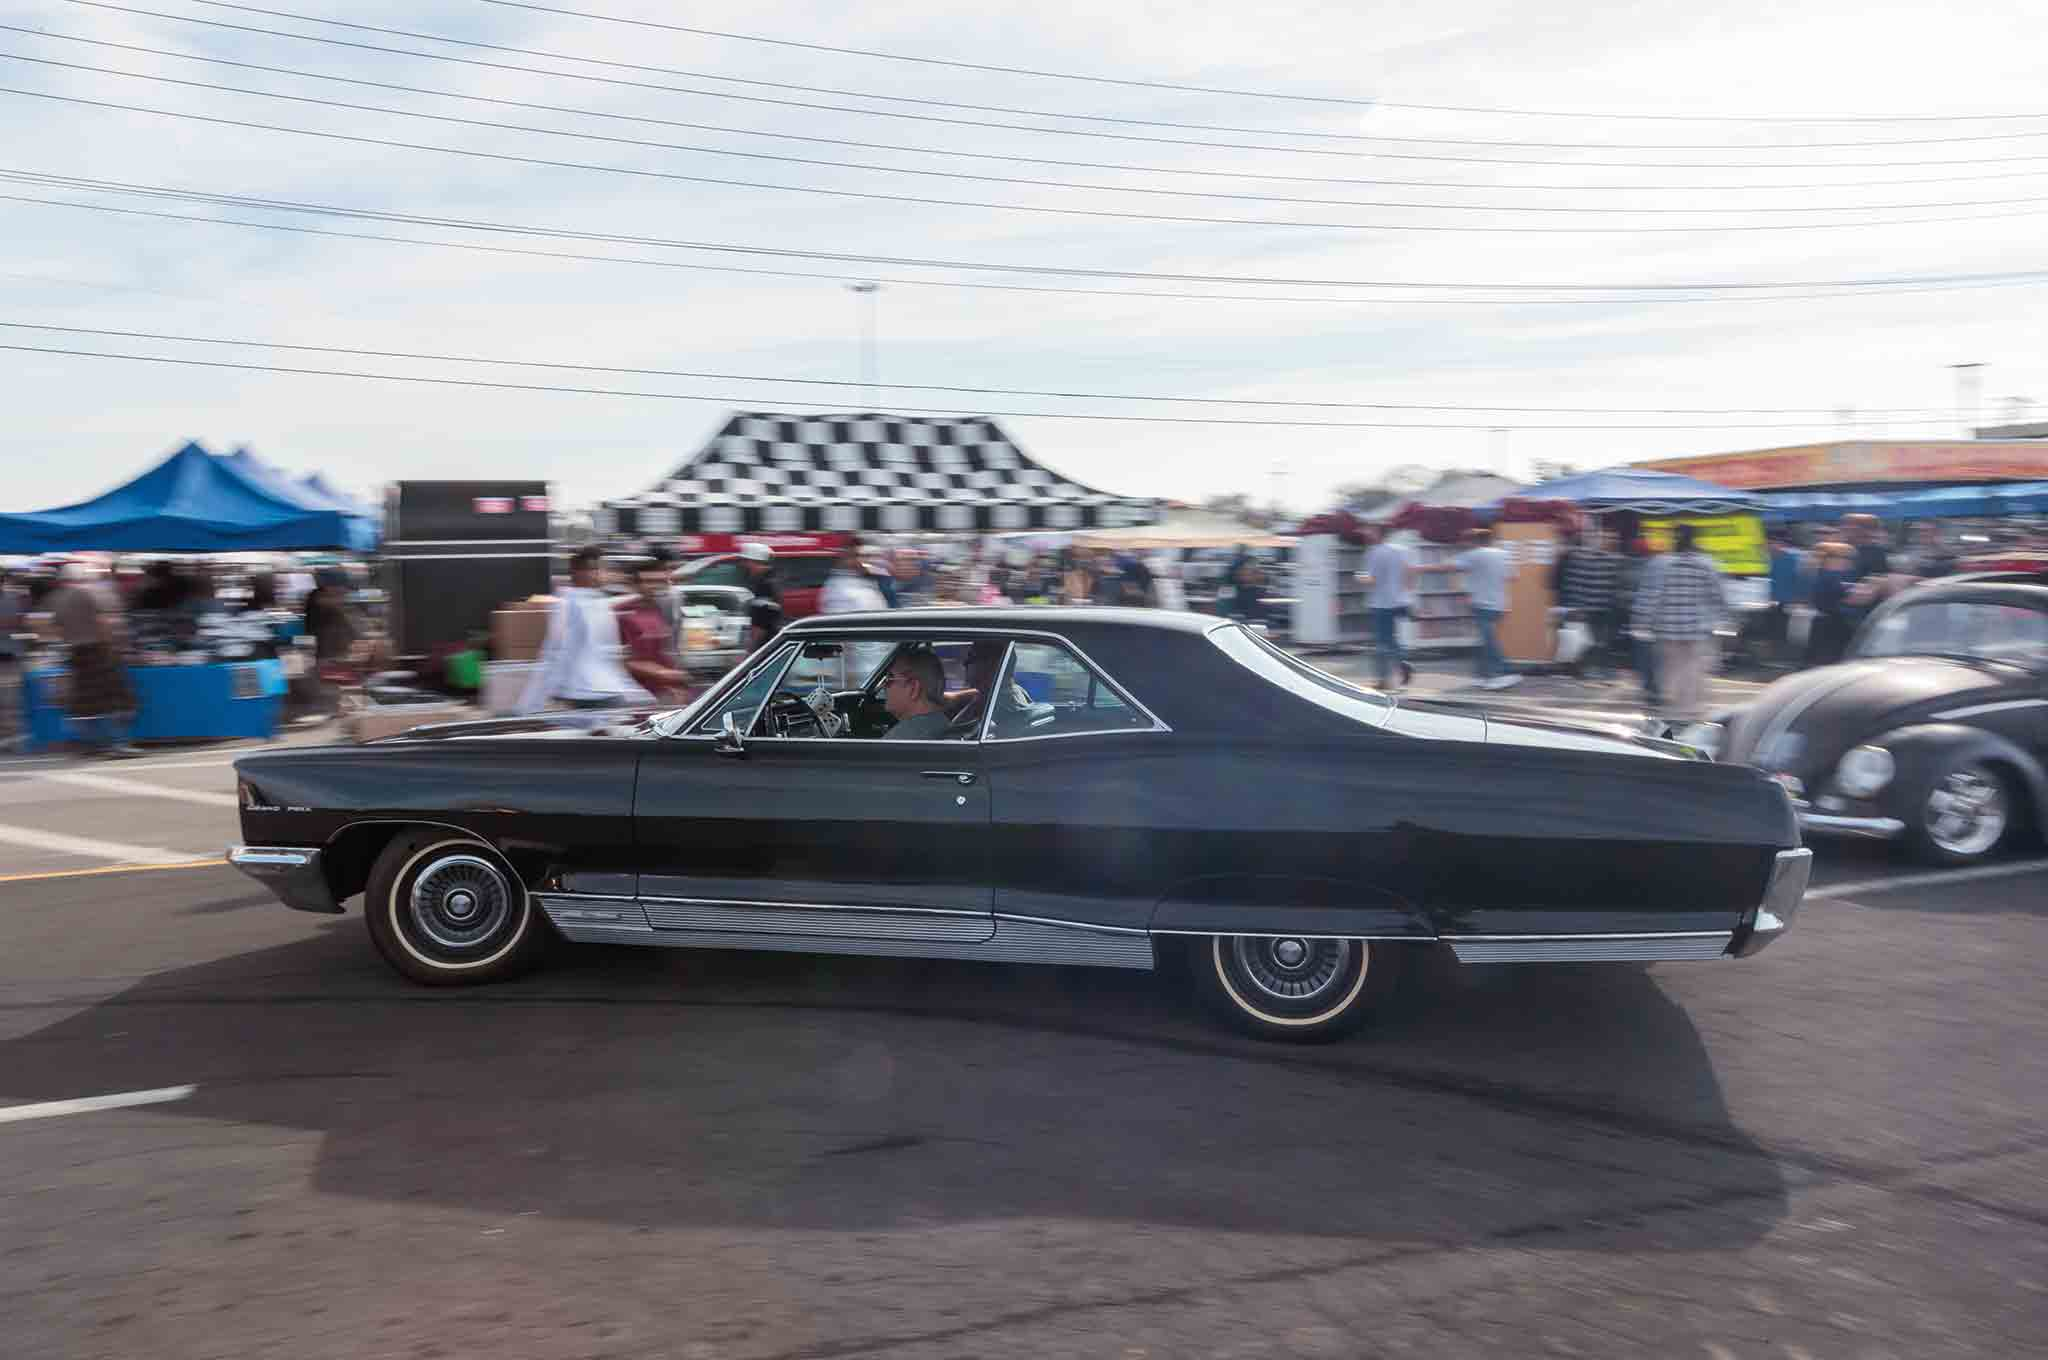 The Pomona Swap Meet Is A So Cal Tradition For Car Fanatics